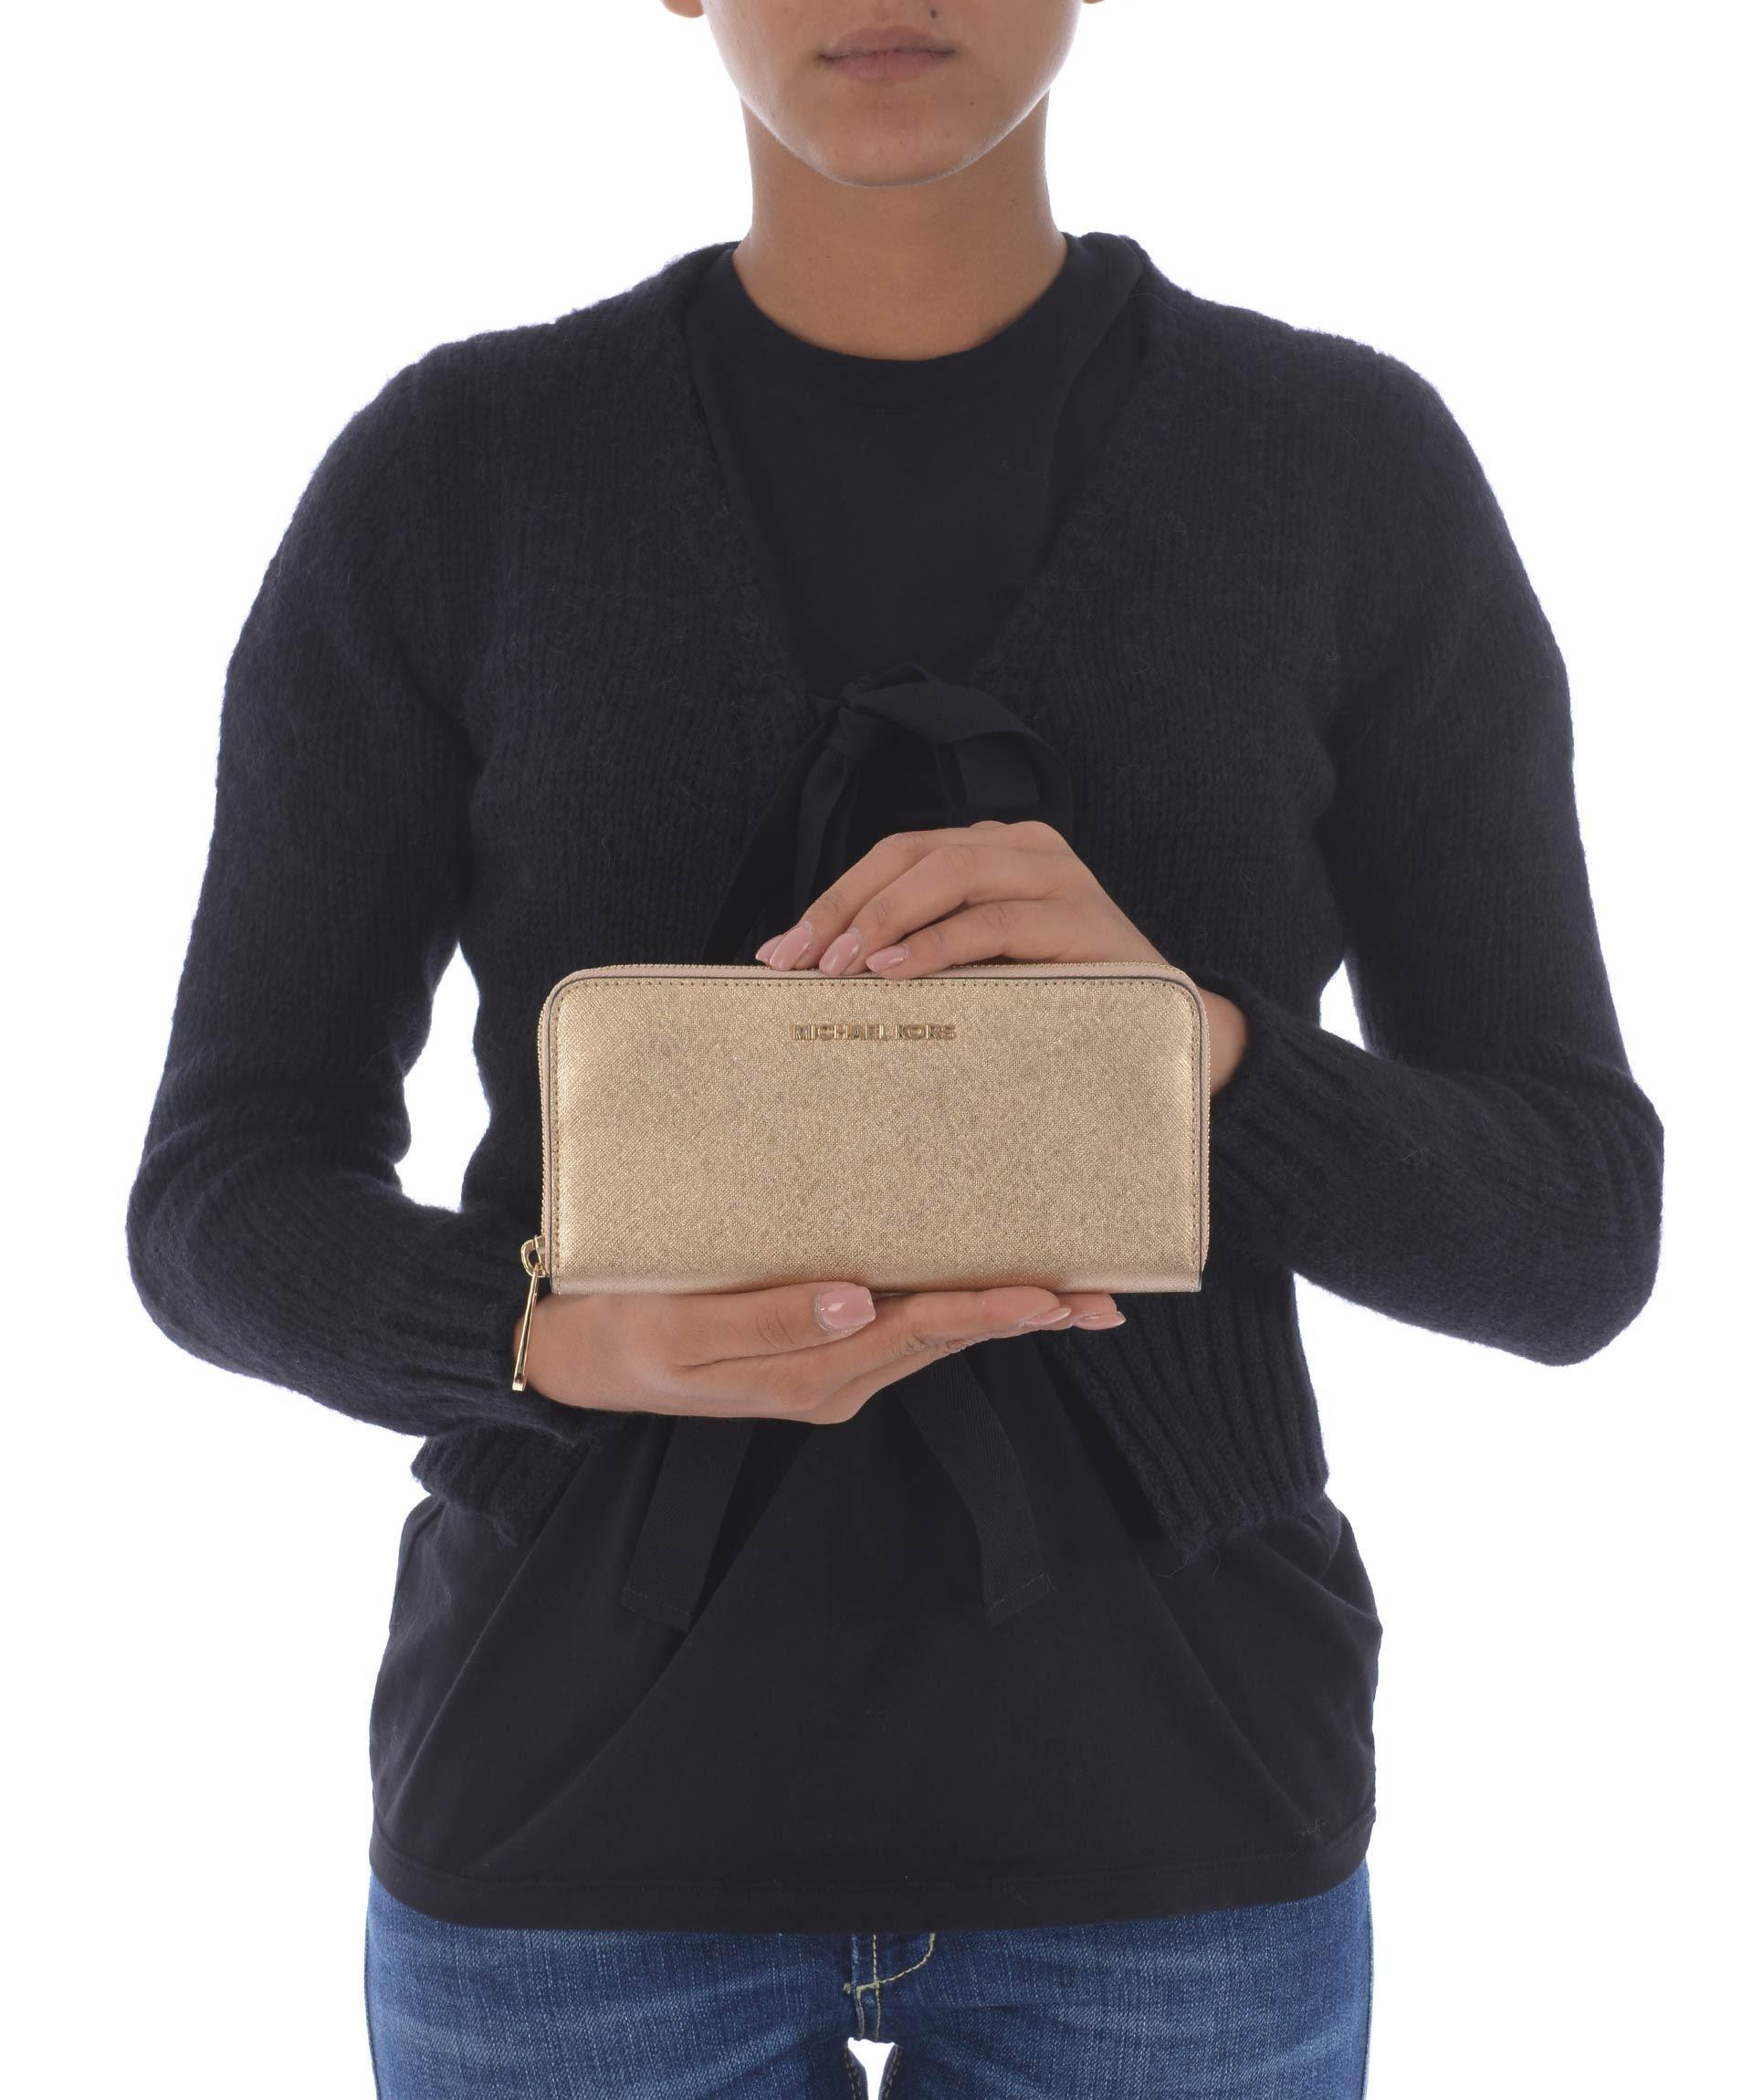 Michael Kors Sophie Trousers In Oro